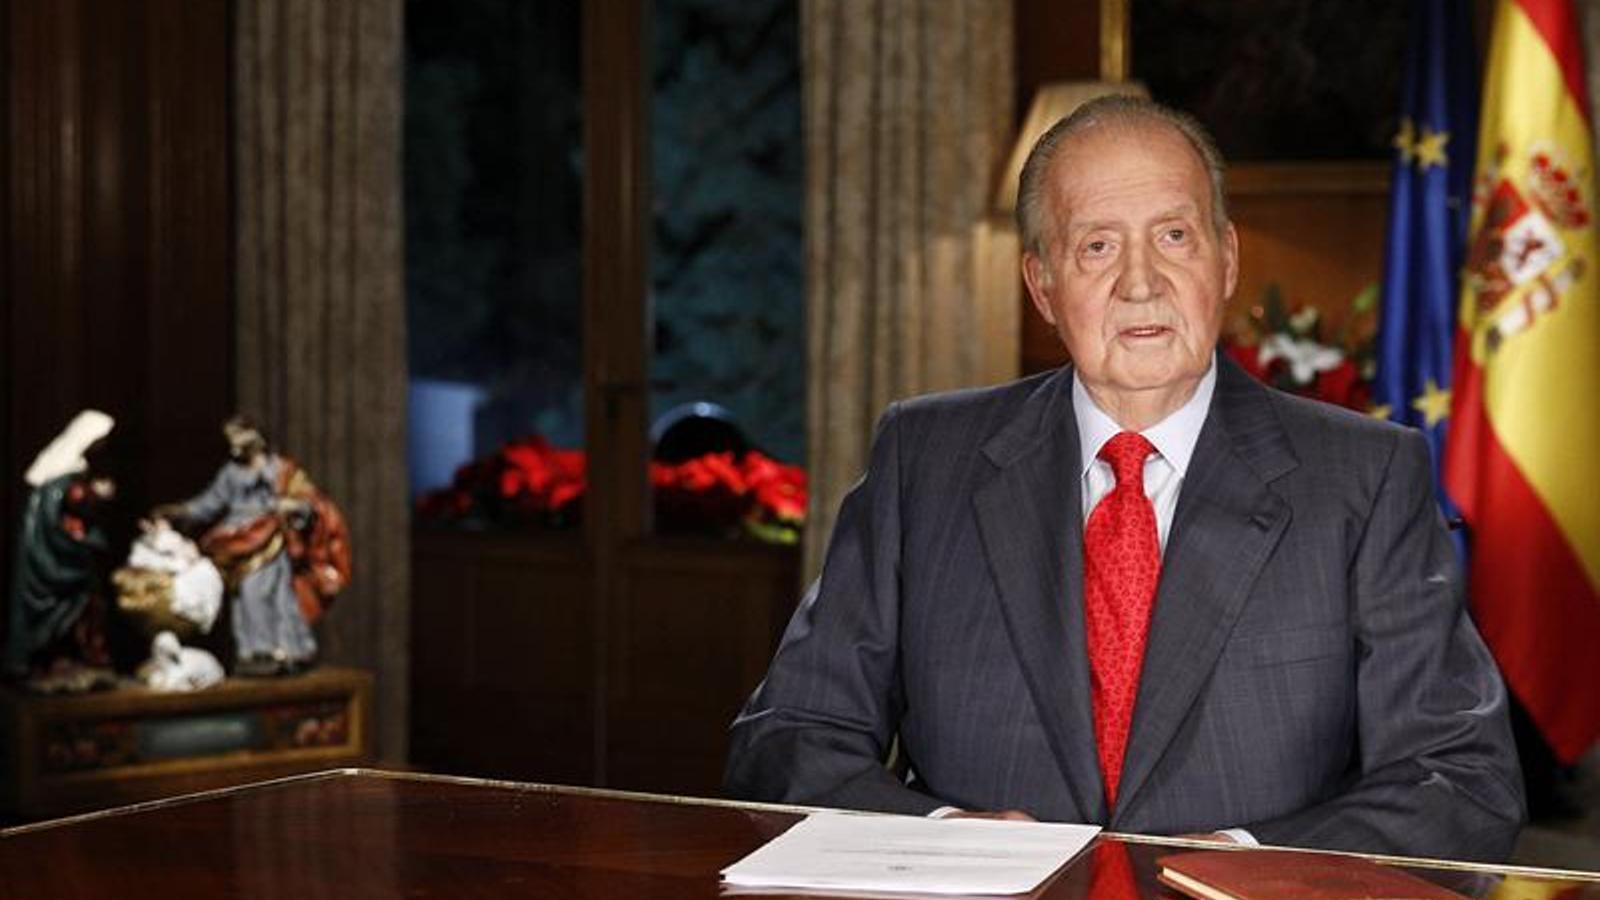 Missatge de Nadal del rei Joan Carles